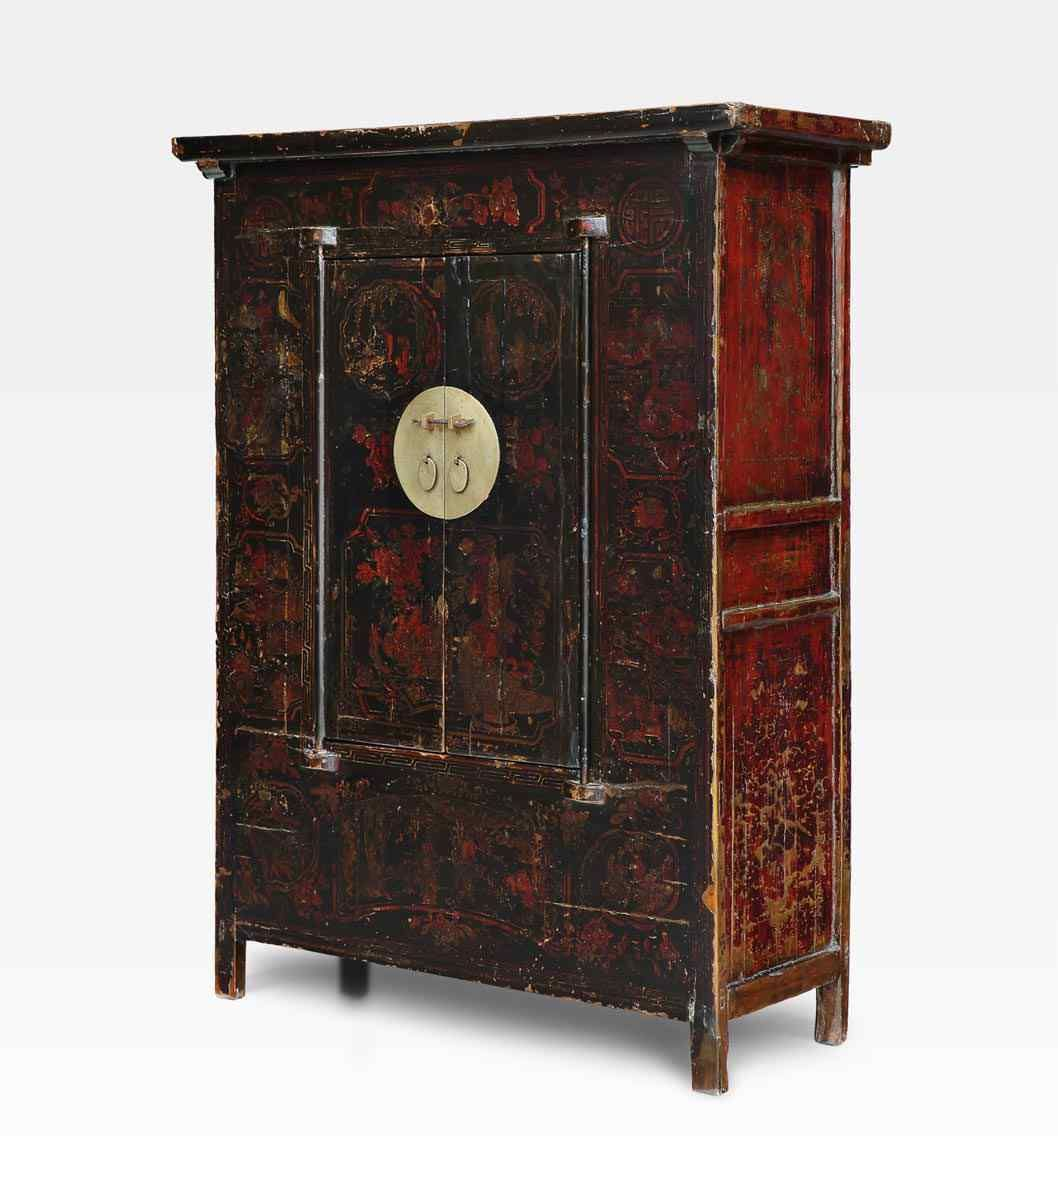 Armadio cinese dipinto, legno di olmo, Dinastia Qing. Available, info: curto.tonio@gmail.com